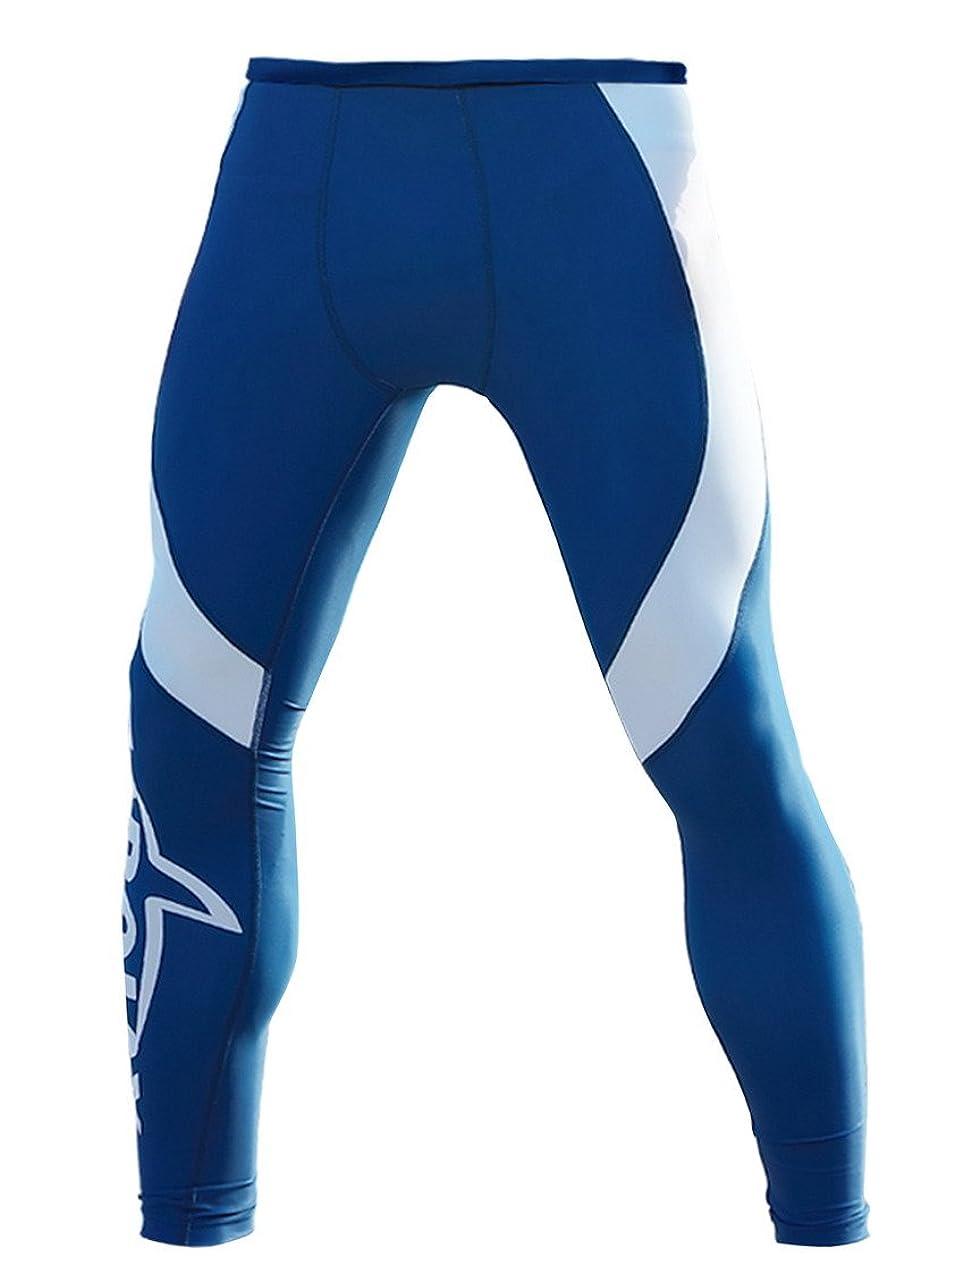 Panegy Men's Dive Lycra Pants Leggings Surf Snorkel Swimmer Rash Guard Tight gly761012184920